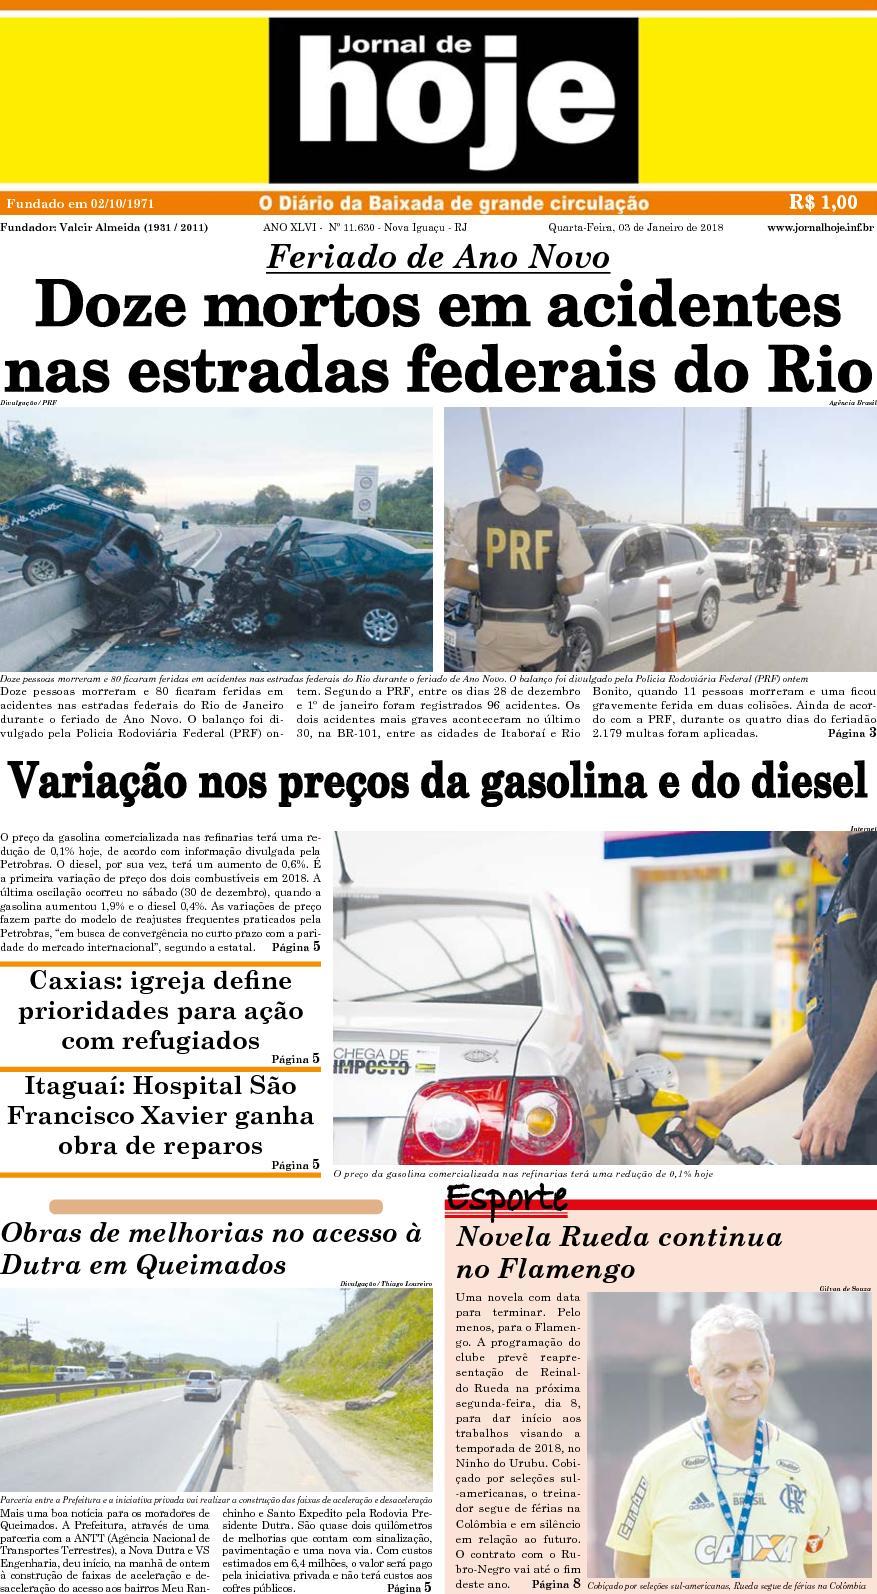 Calaméo - Jornal De Hoje 030118 3a5afe390ddb3